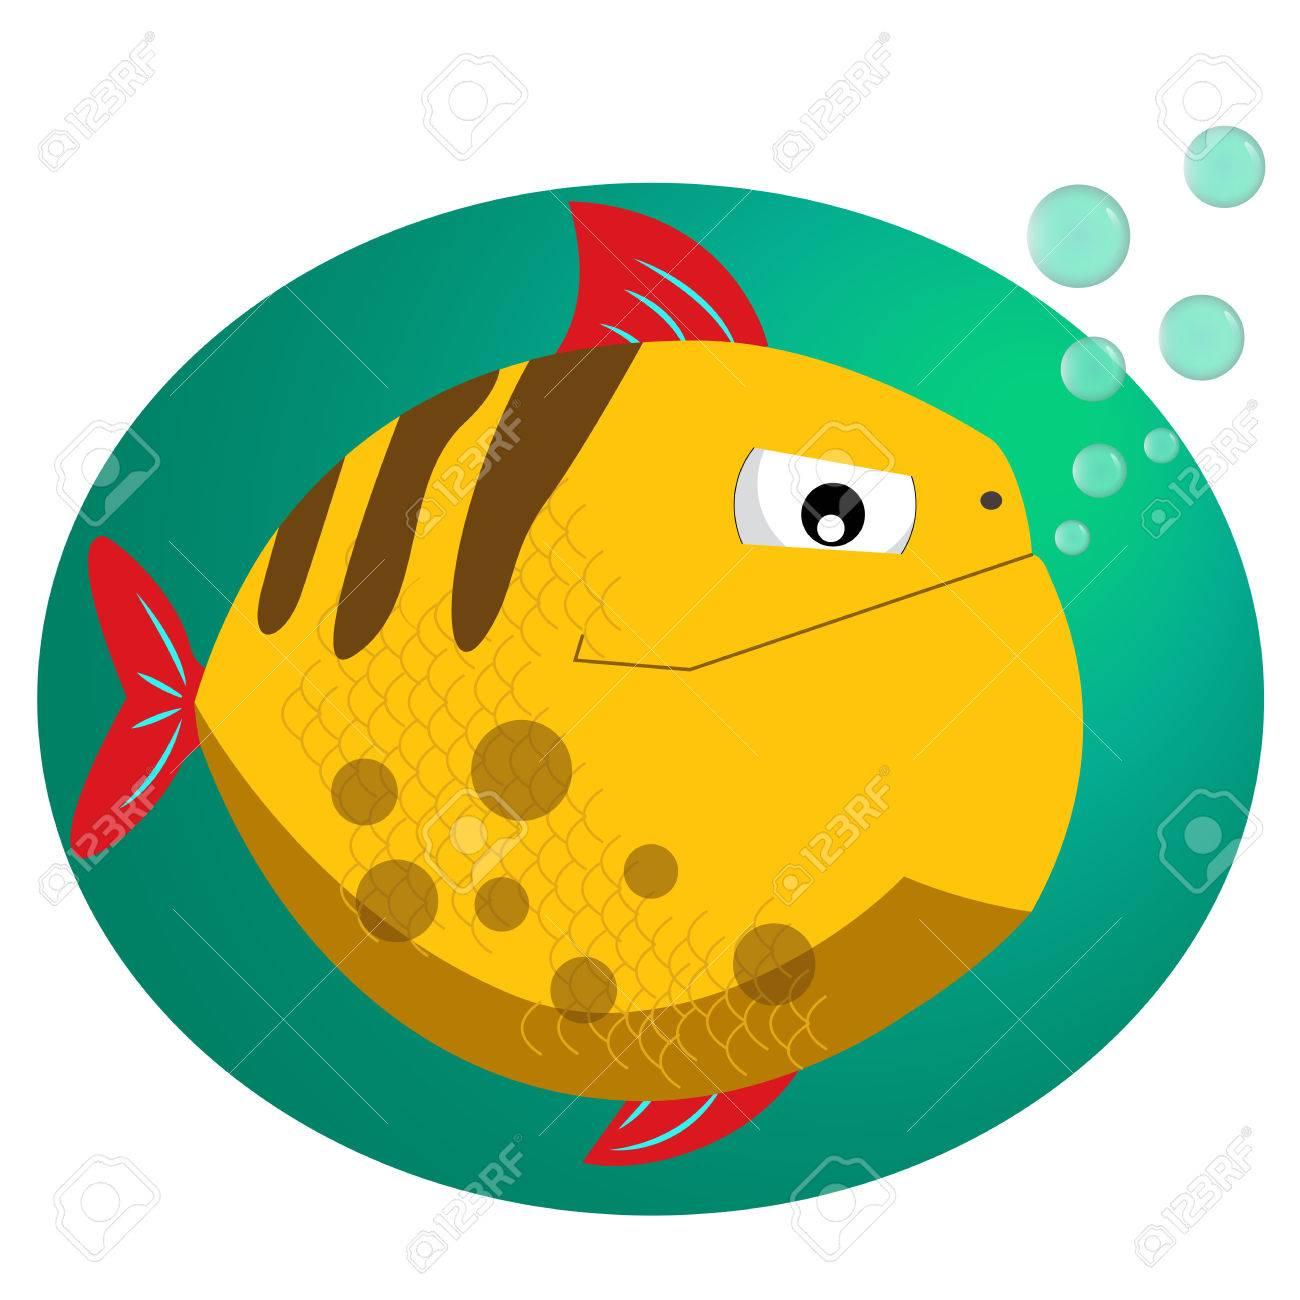 Piraña. Ilustración Vectorial De Estilo Plano De Pescado. Peces ...